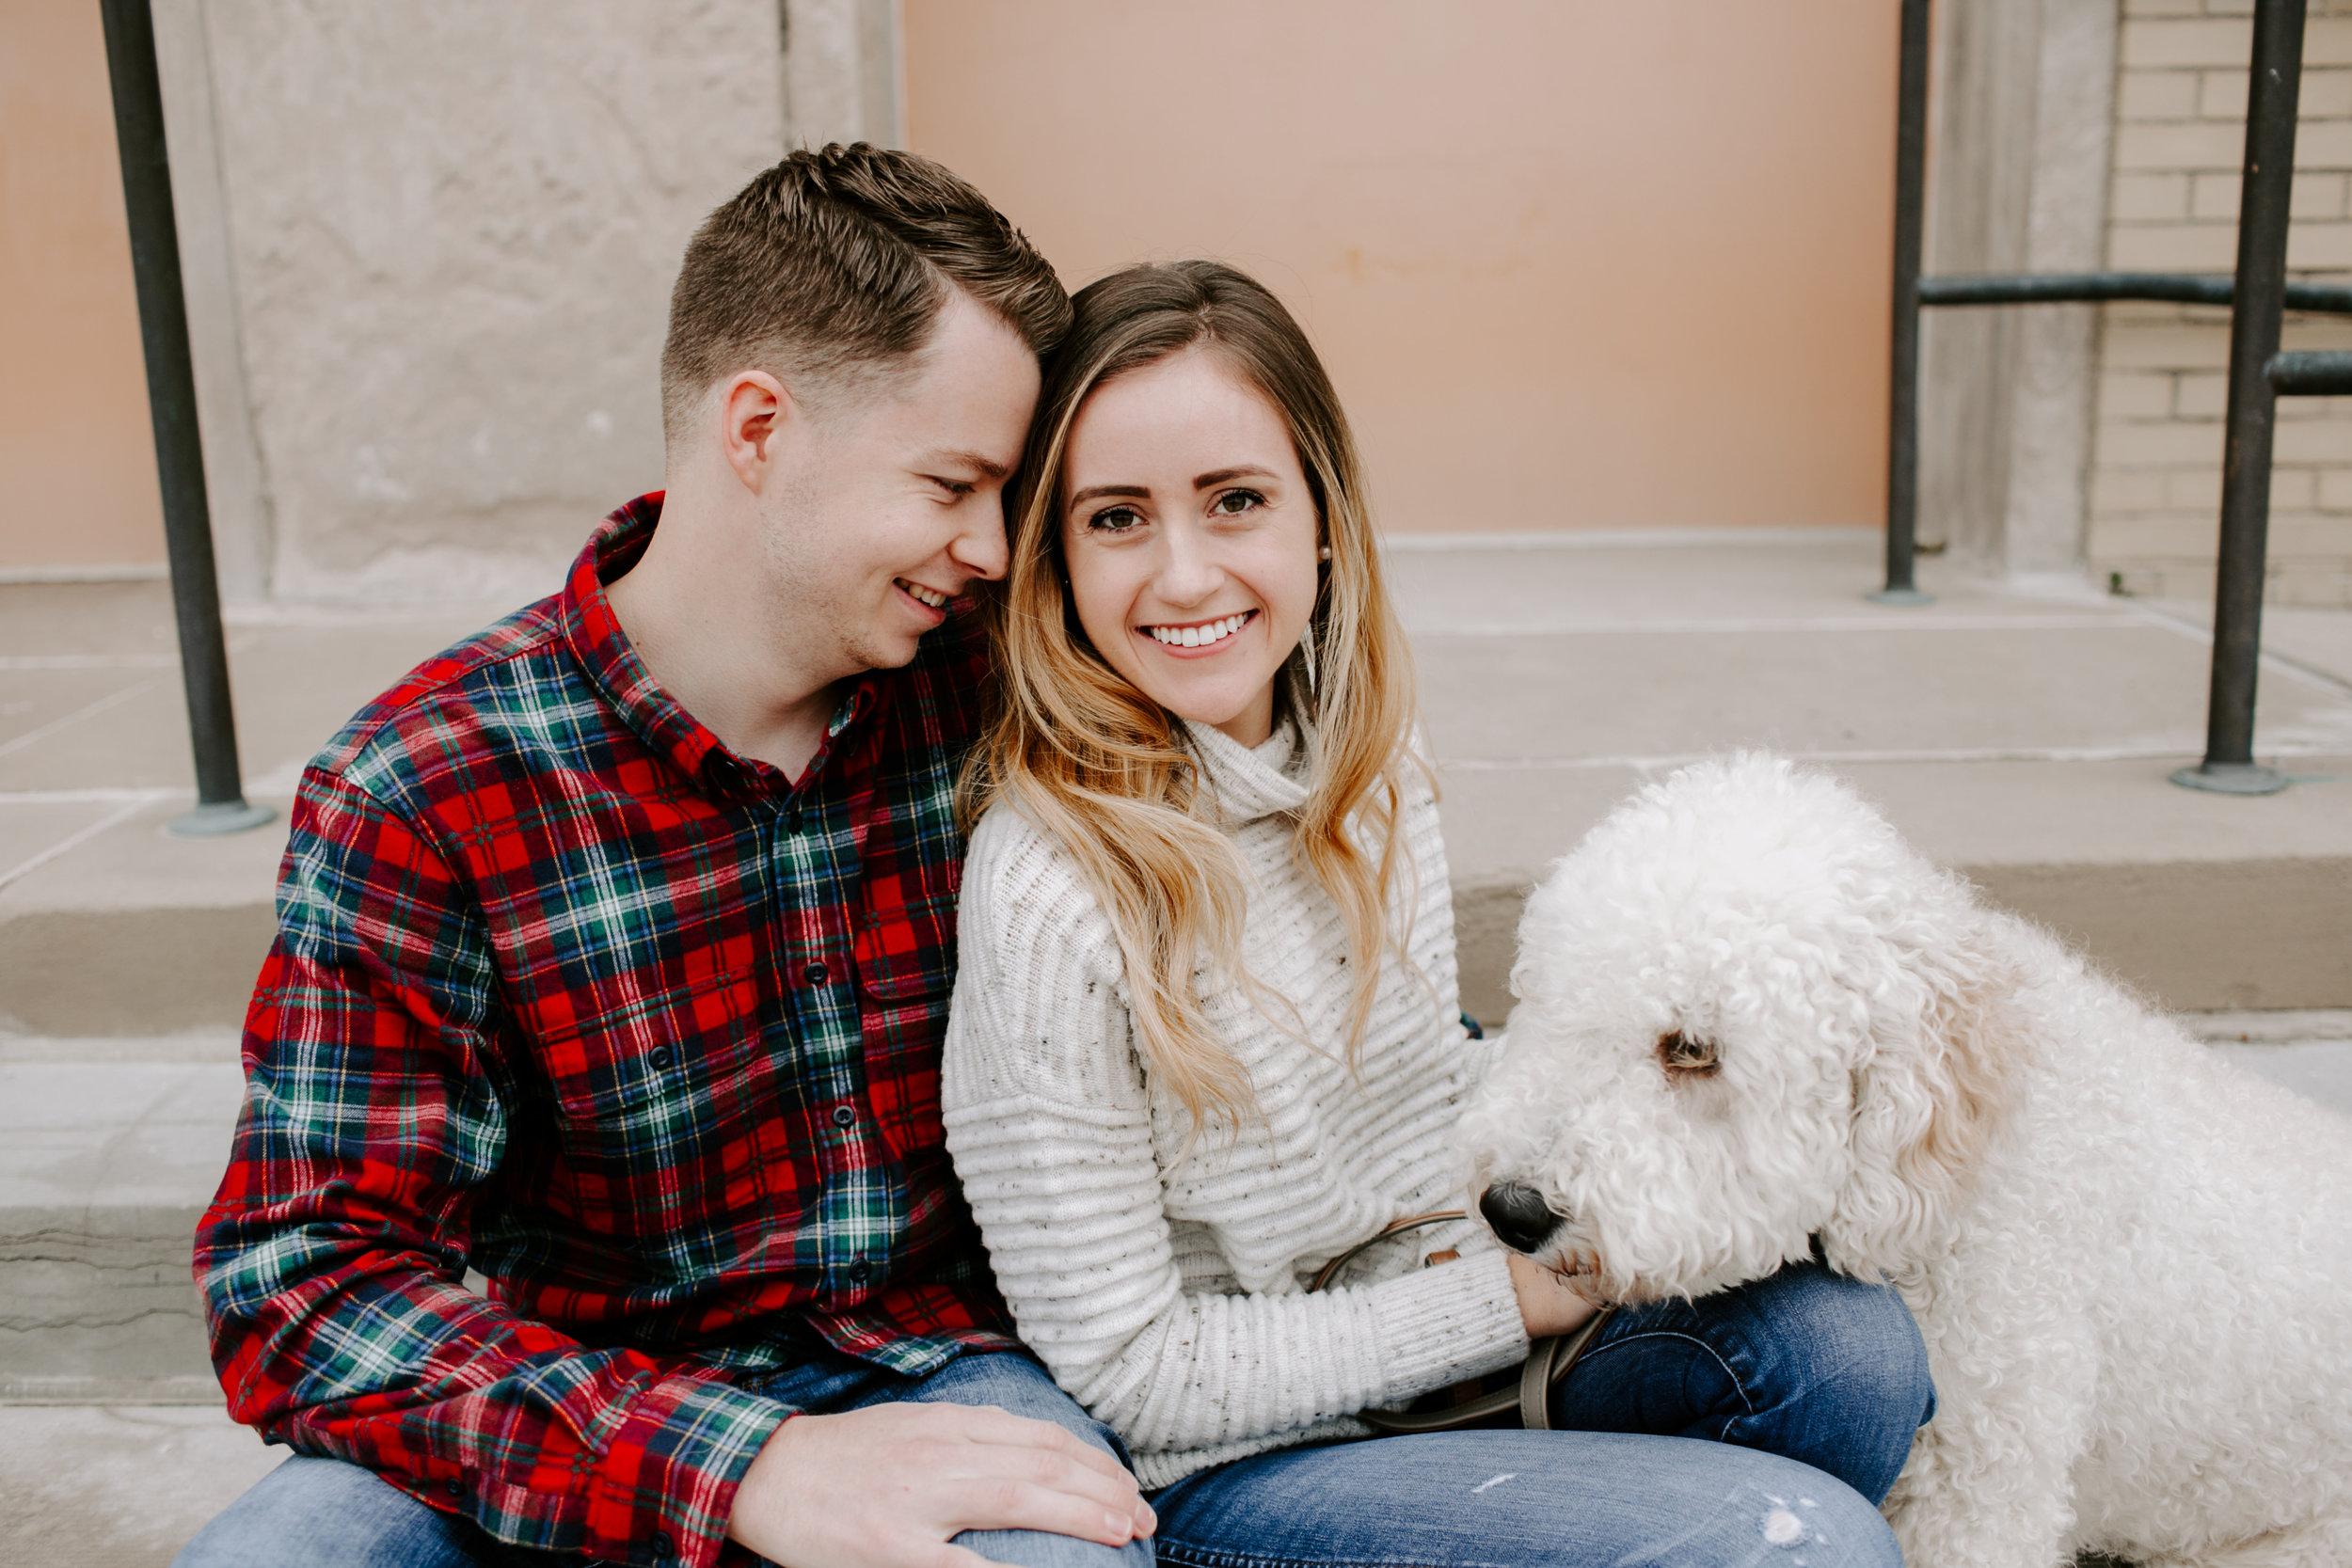 Hallie and Tyler Couple Photos downtown Broad Ripple Indiana Emily Elyse Wehner Photography LLC-7.jpg